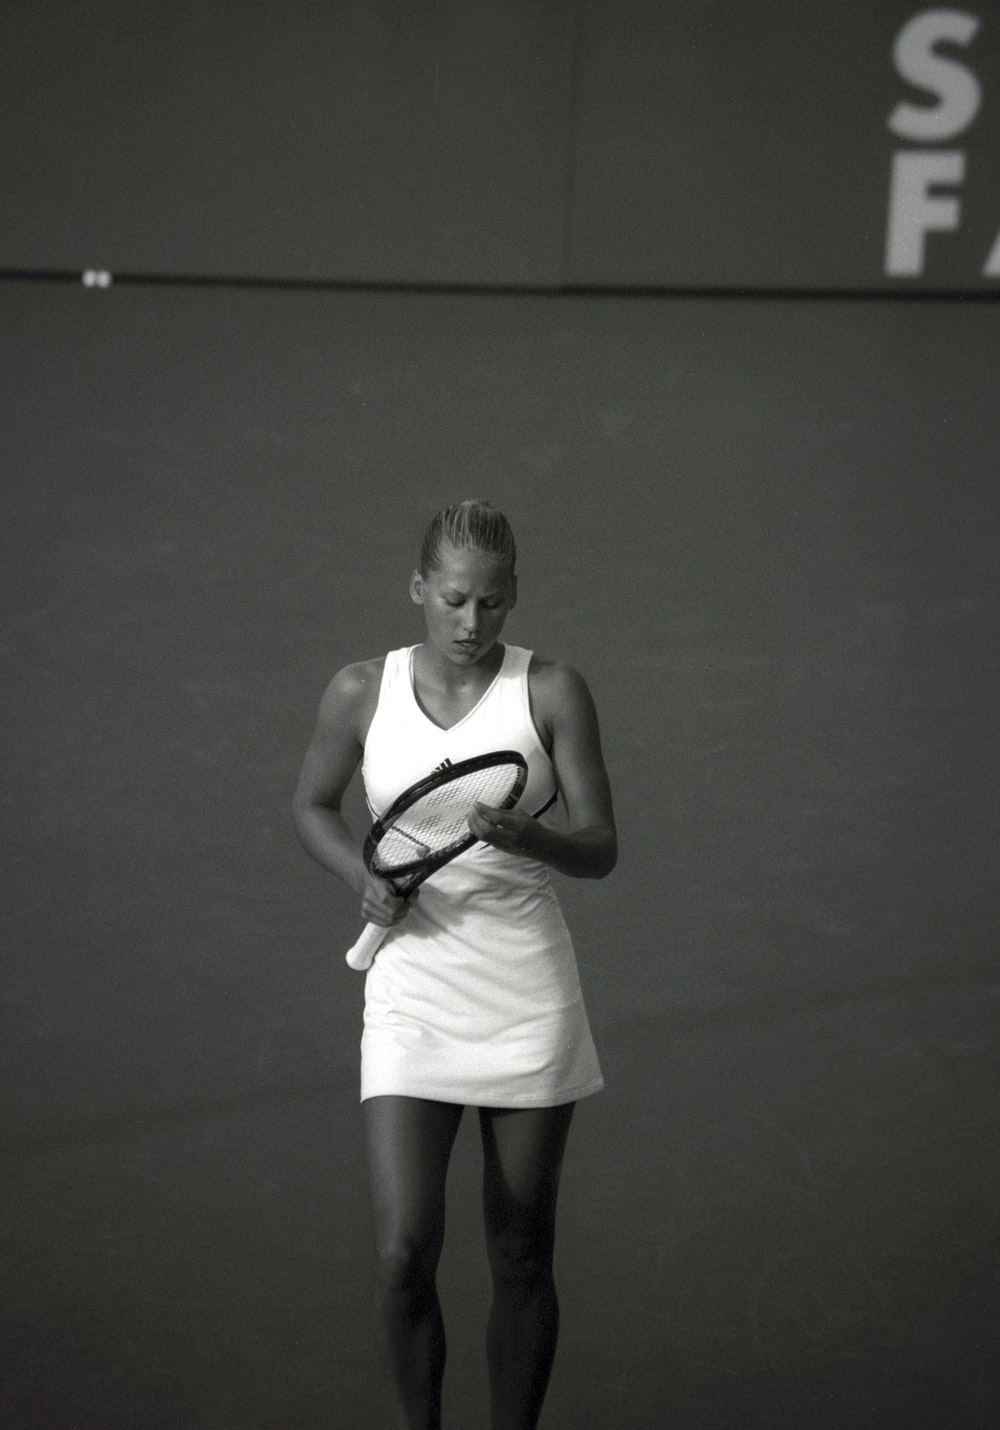 woman wearing dress holding tennis racket